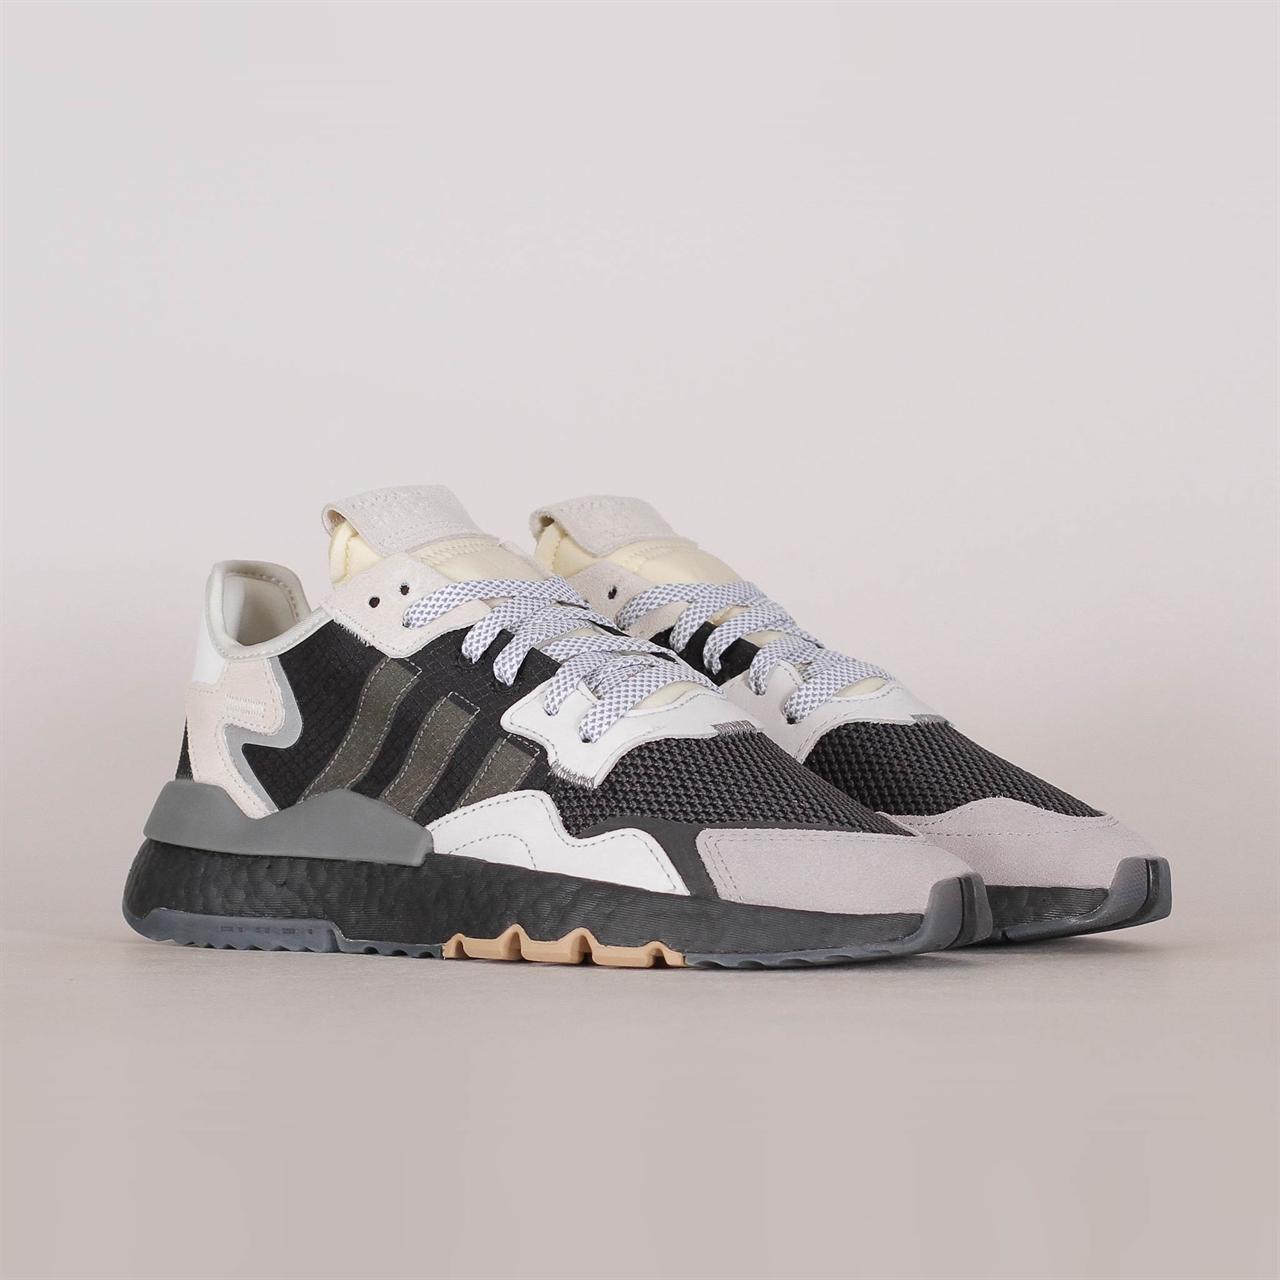 5f1f3b680da Adidas Originals Nite Jogger (BD7933) - Shelta